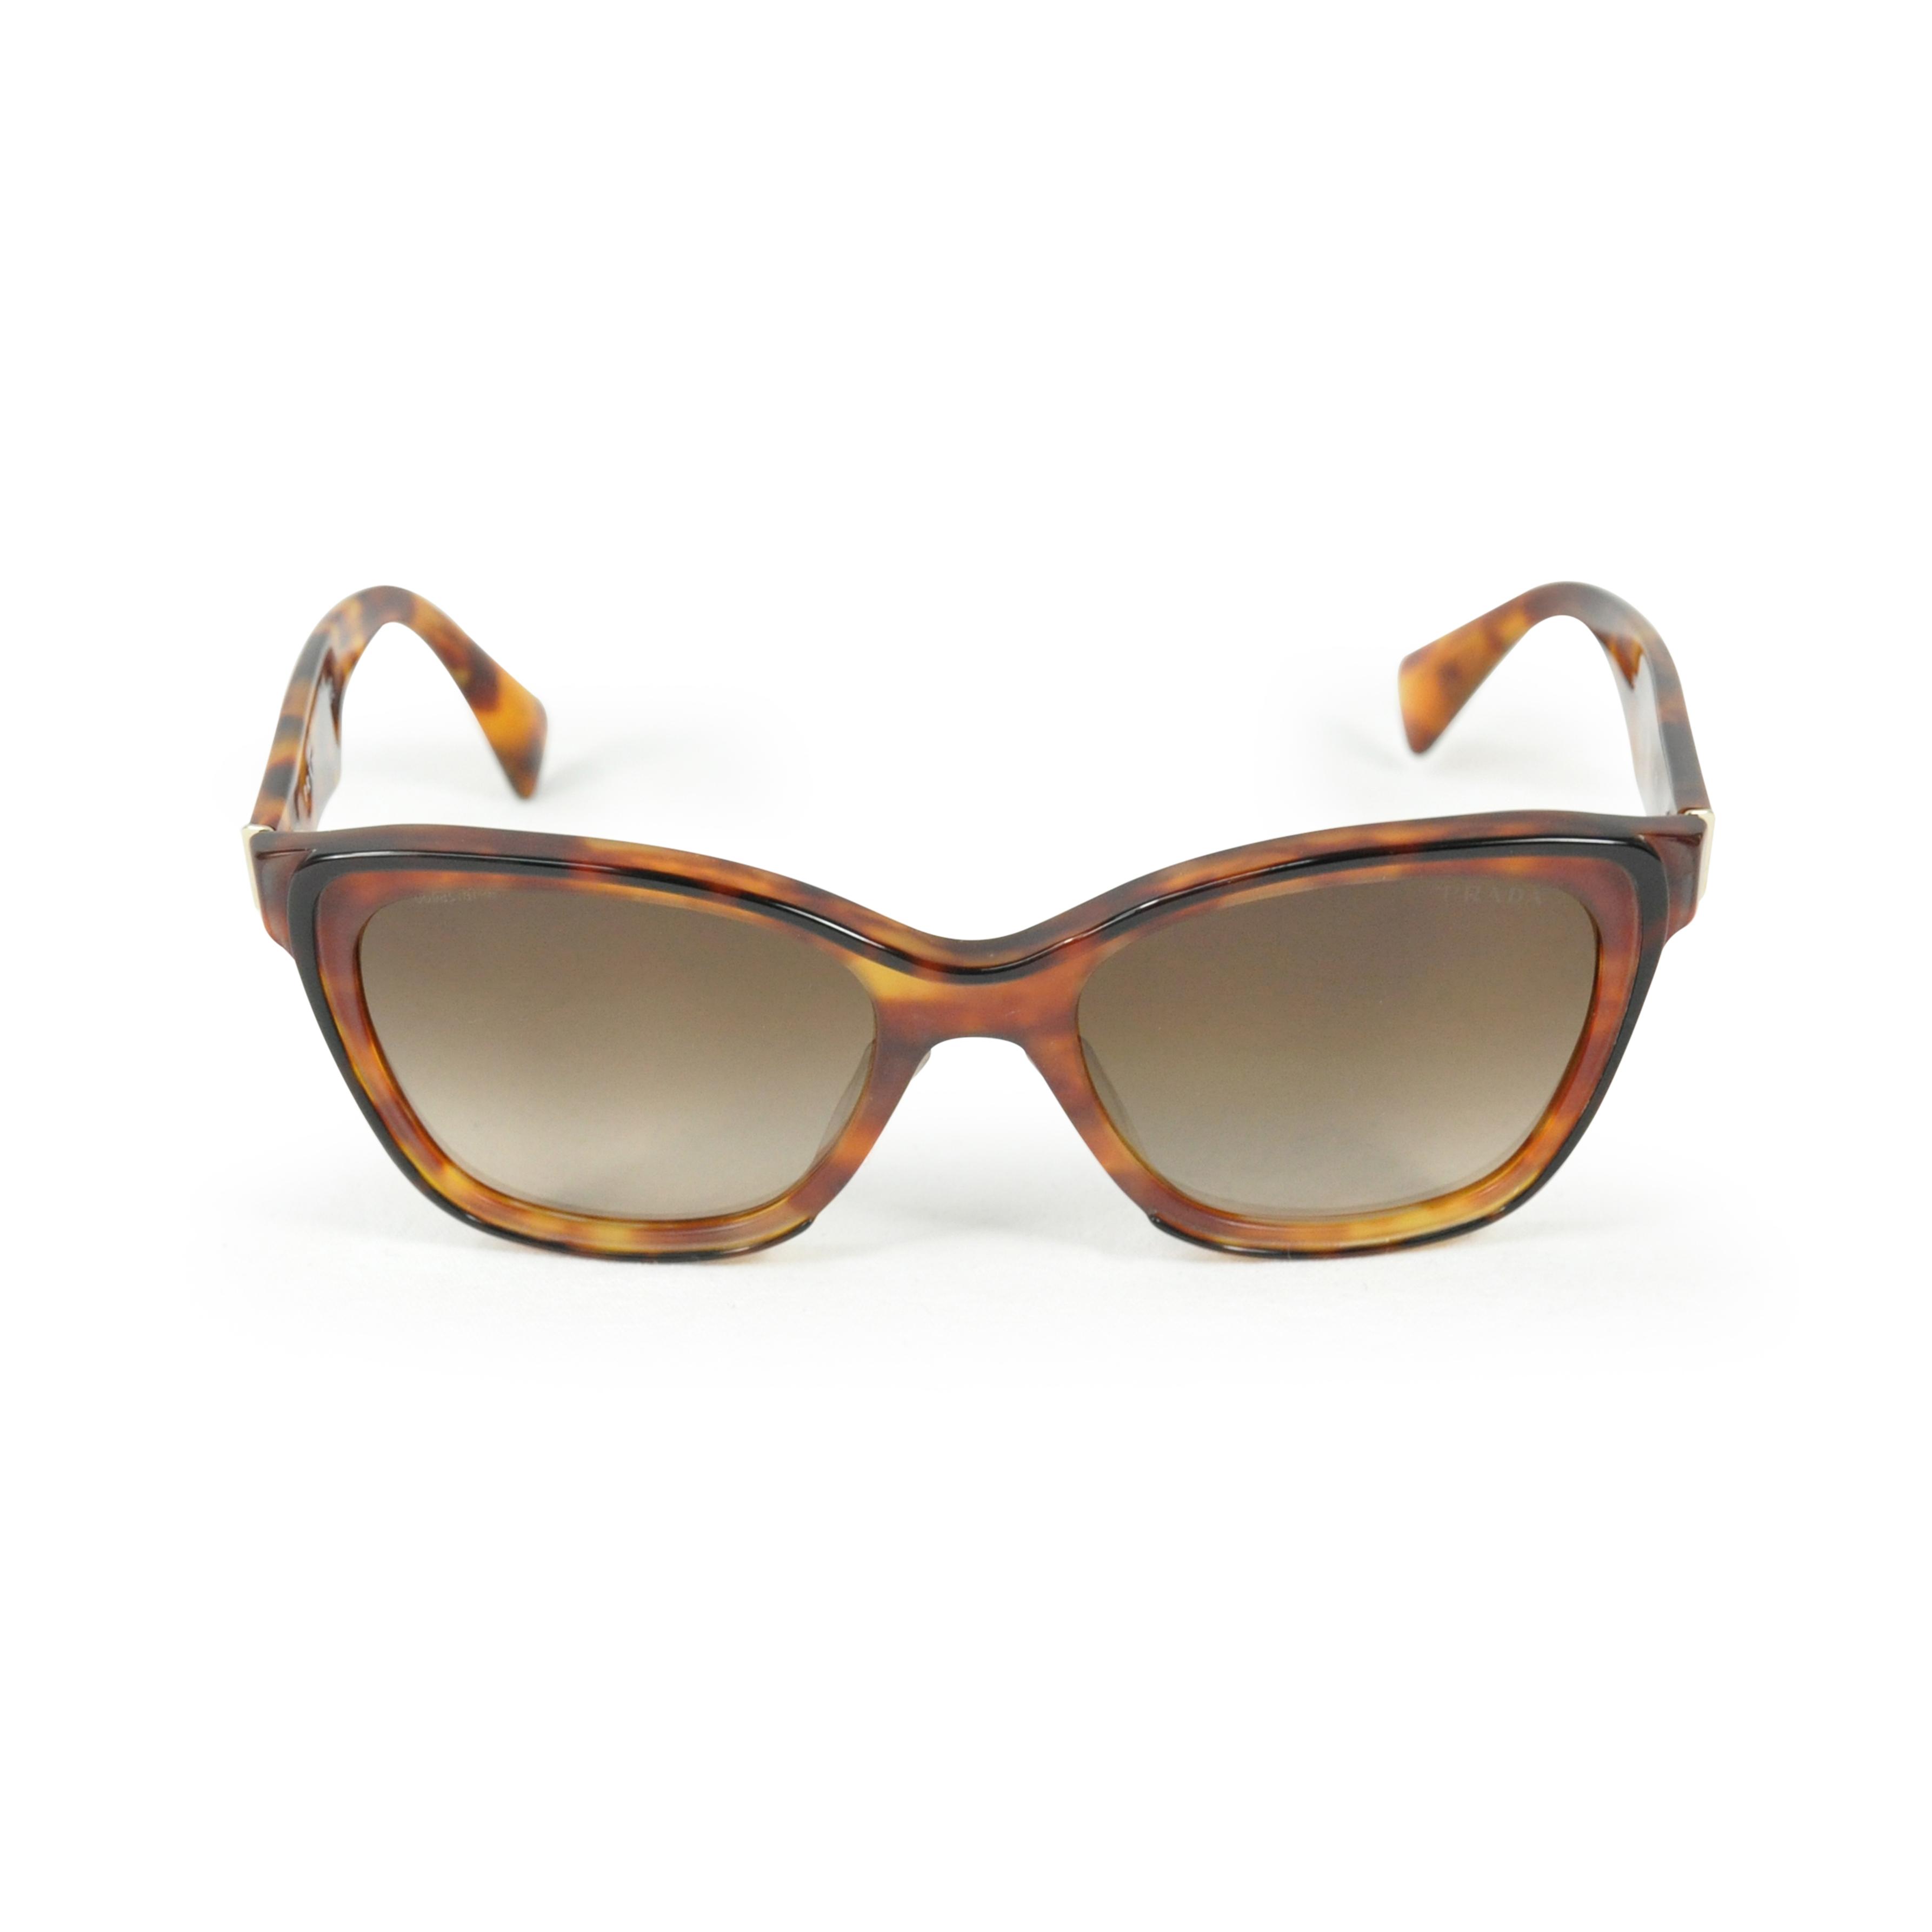 2c16640d41 Authentic Second Hand Prada Tortoise Shell Sunglasses (PSS-200-00376)